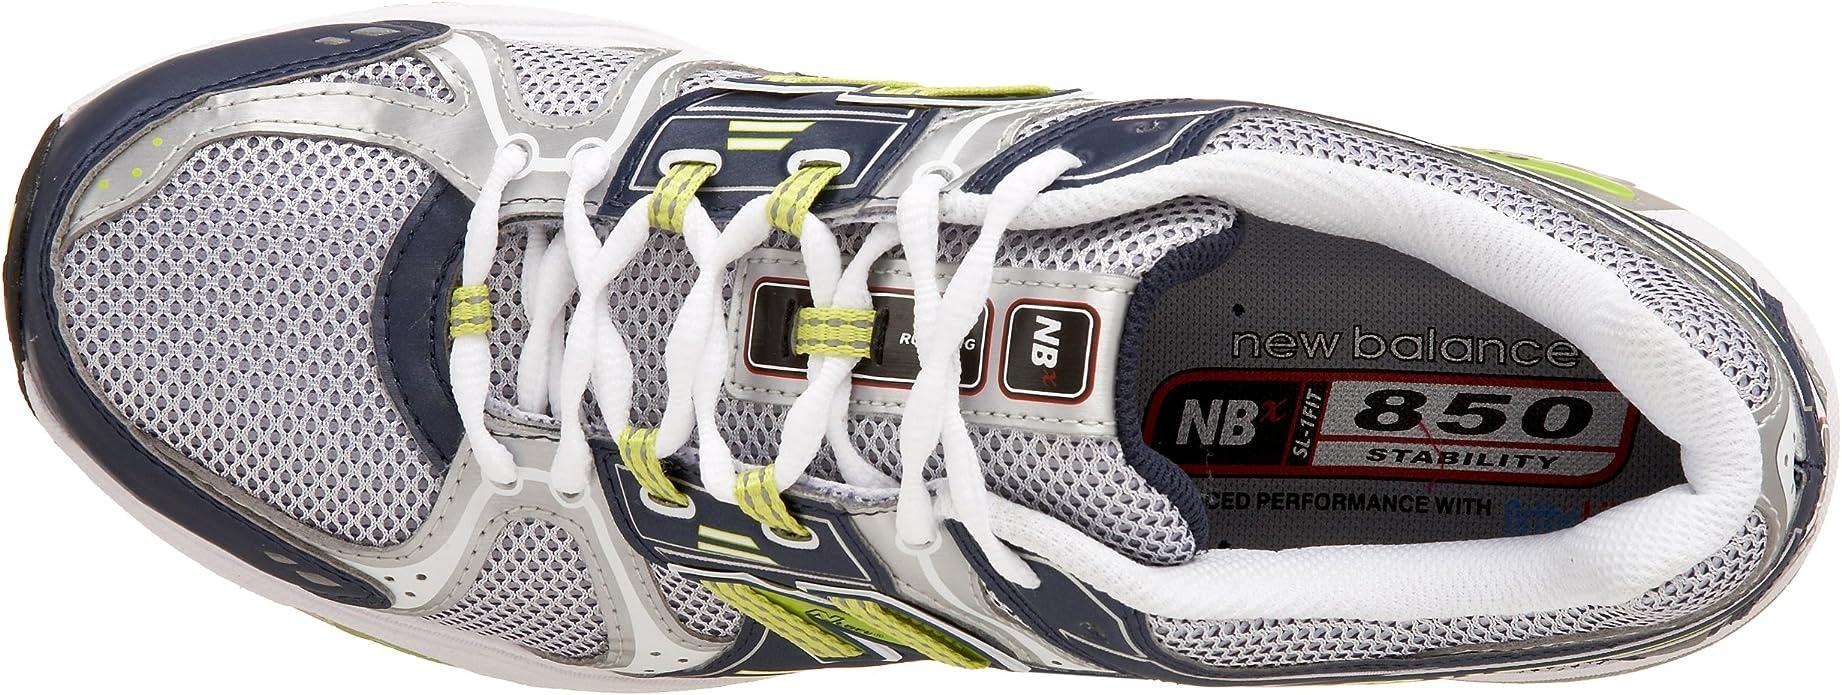 New Balance Men's MR850 Running Shoe